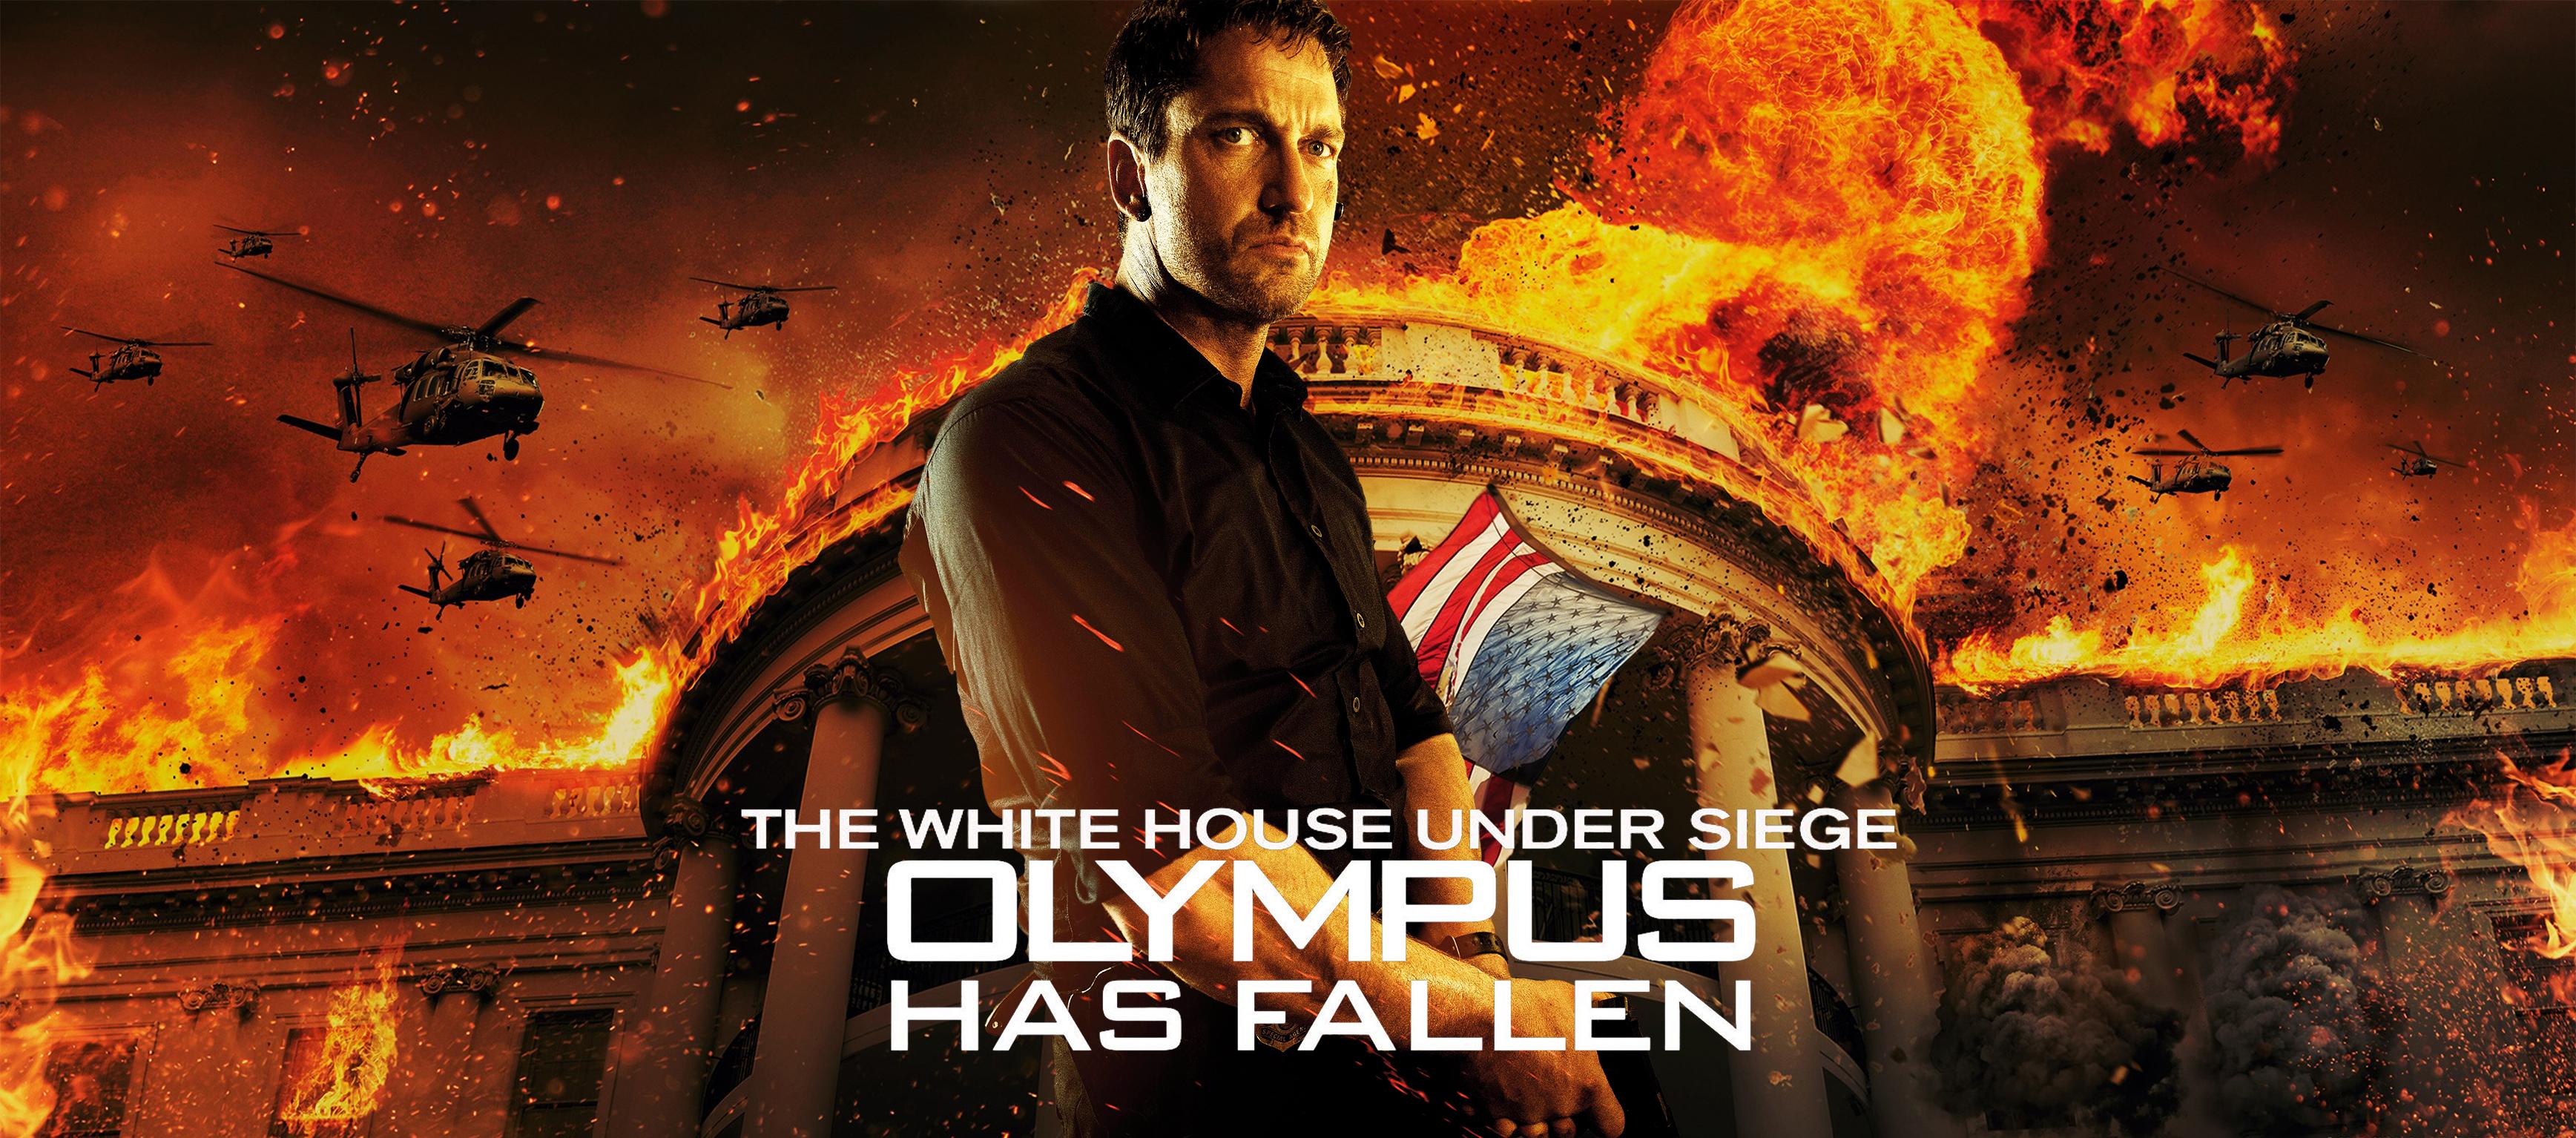 Olympus Has Fallen Movie Review Spoiler Alert